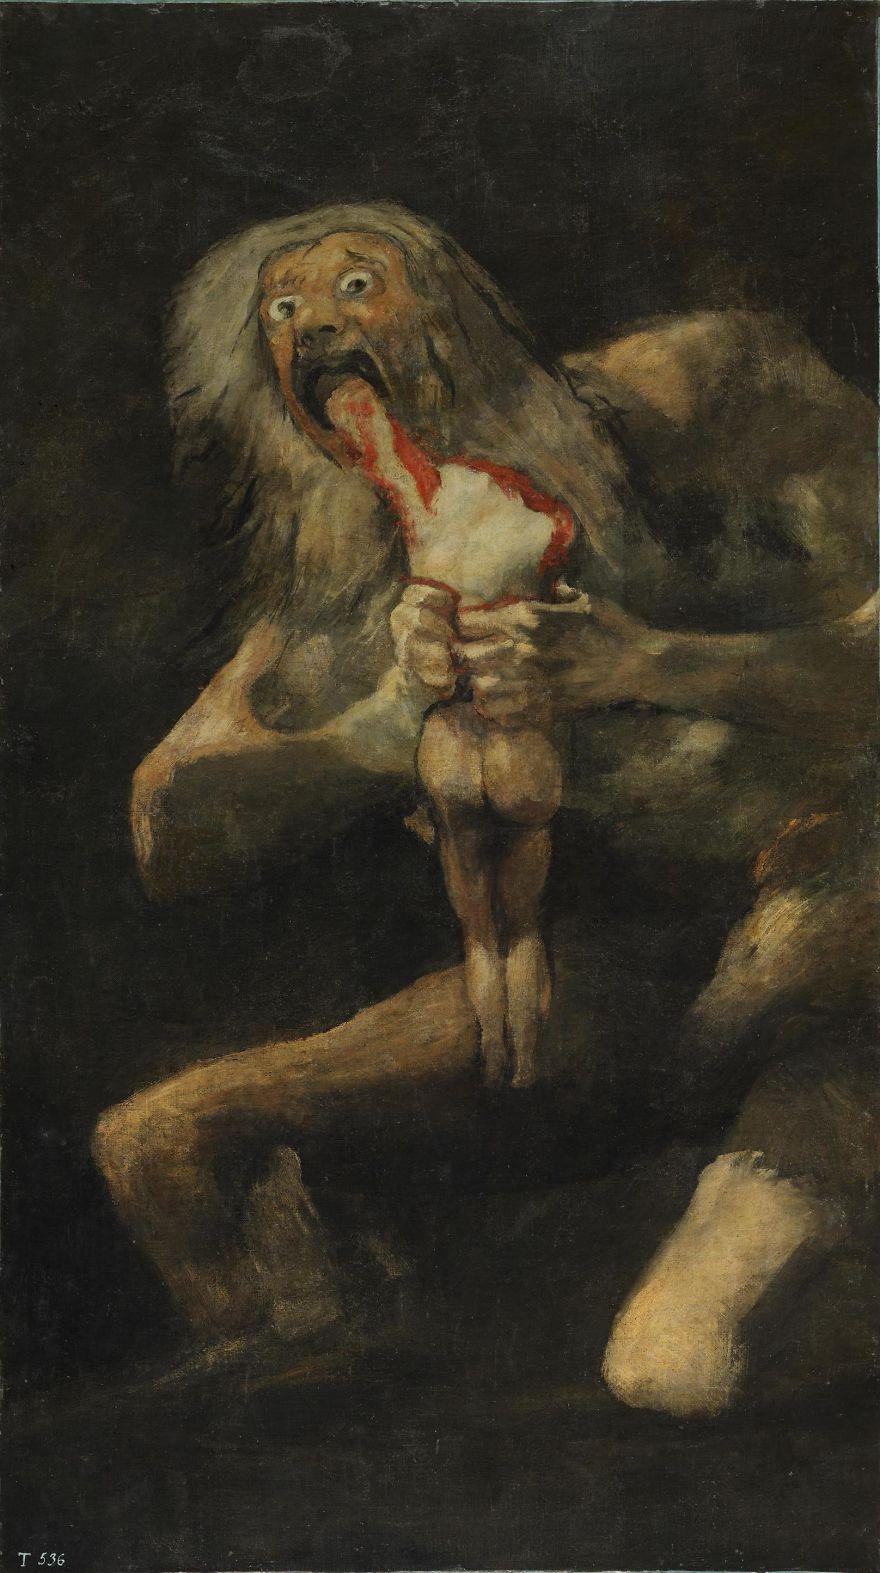 Saturn Devouring His Son, Francisco Goya, 1823